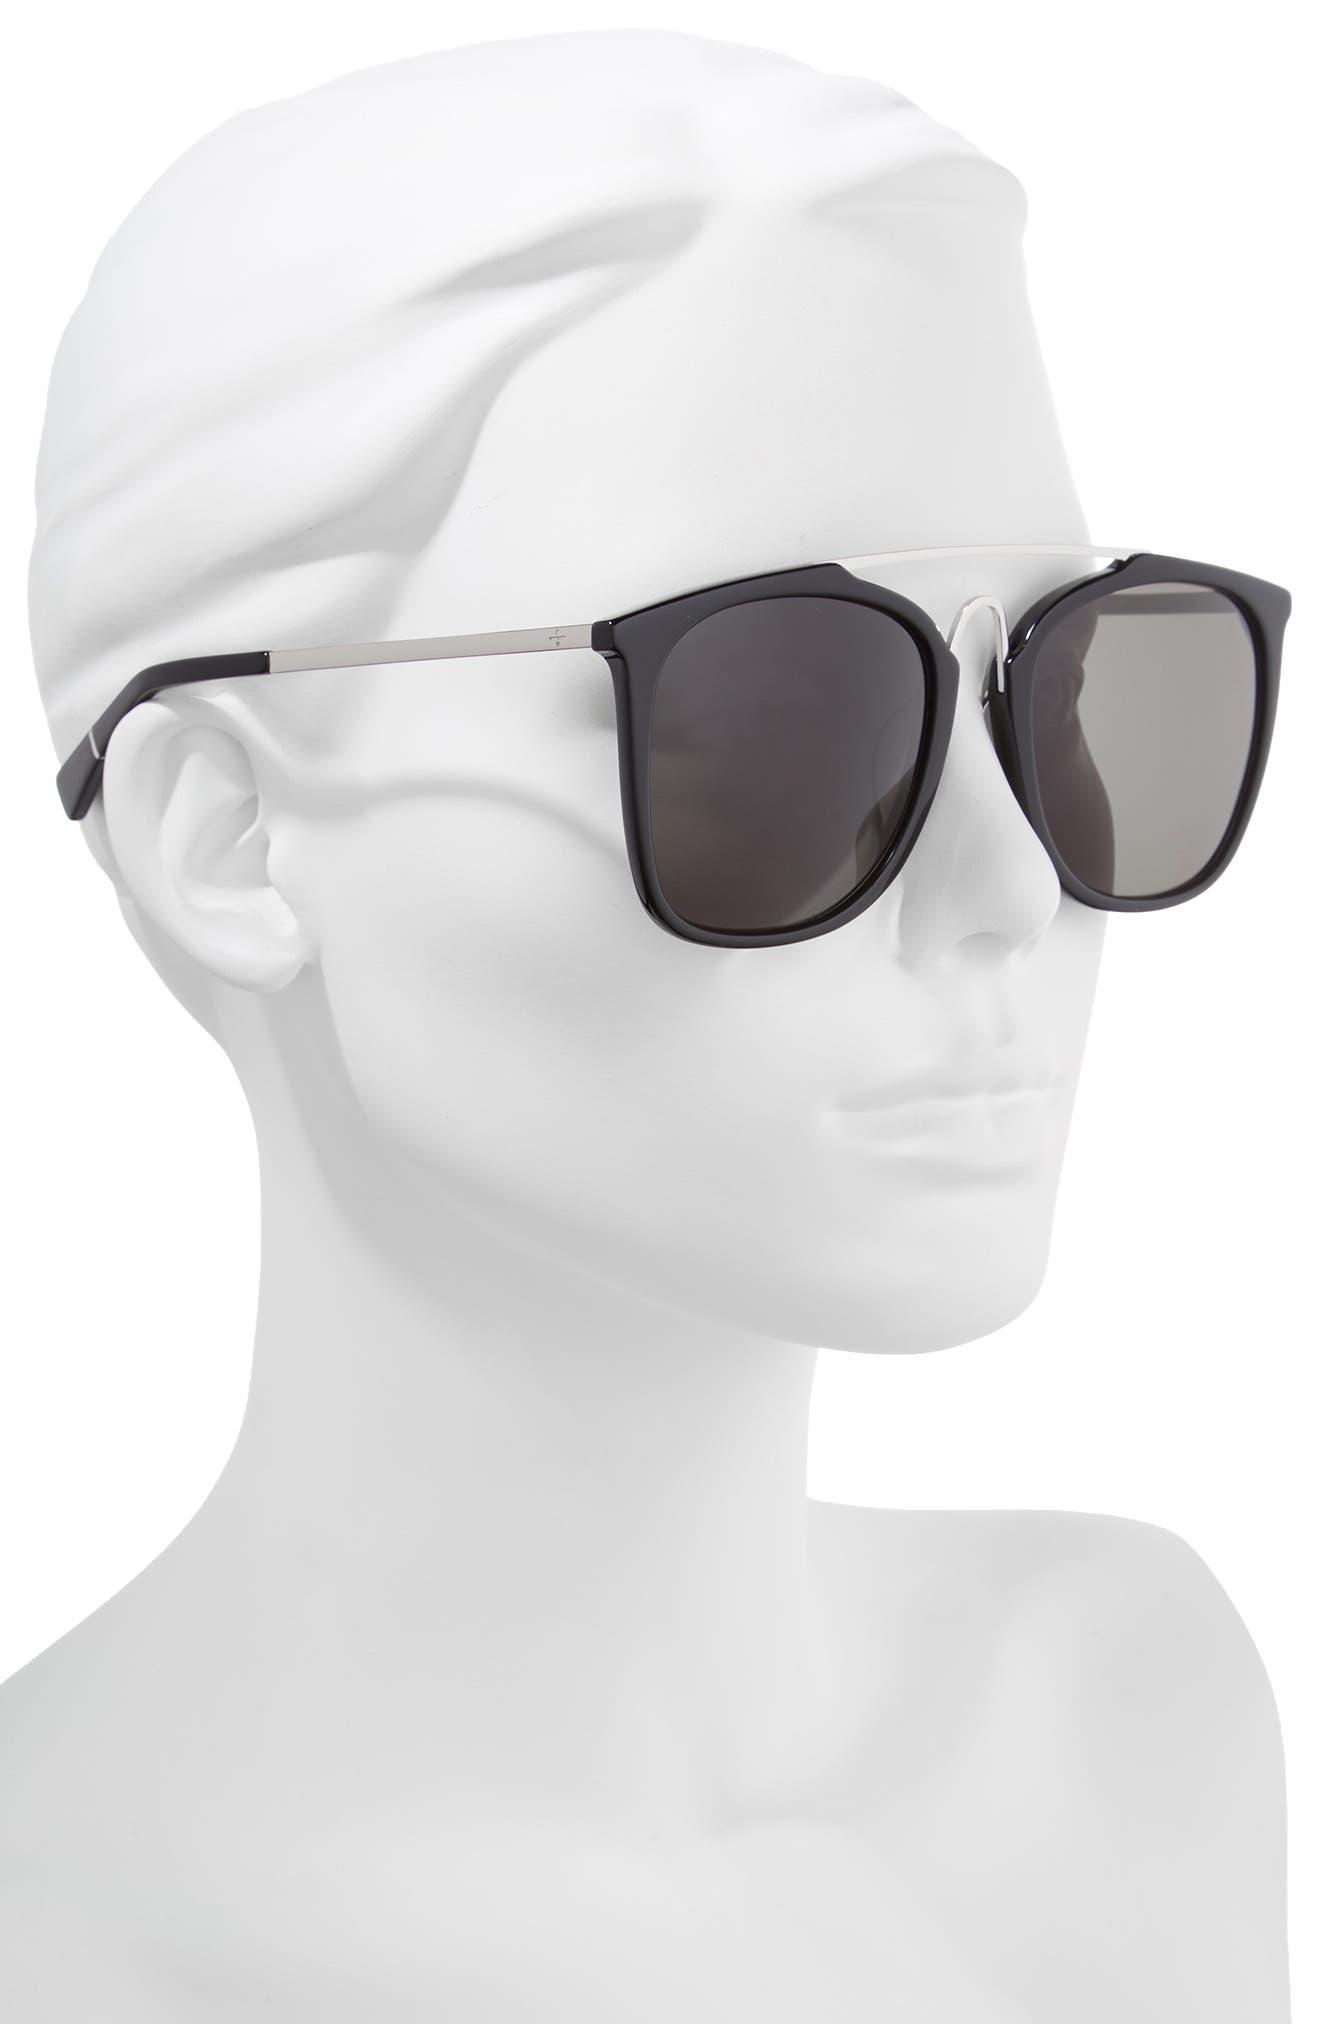 BLANC & ECLARE Bangkok 57mm Polarized Sunglasses,                             Alternate thumbnail 3, color,